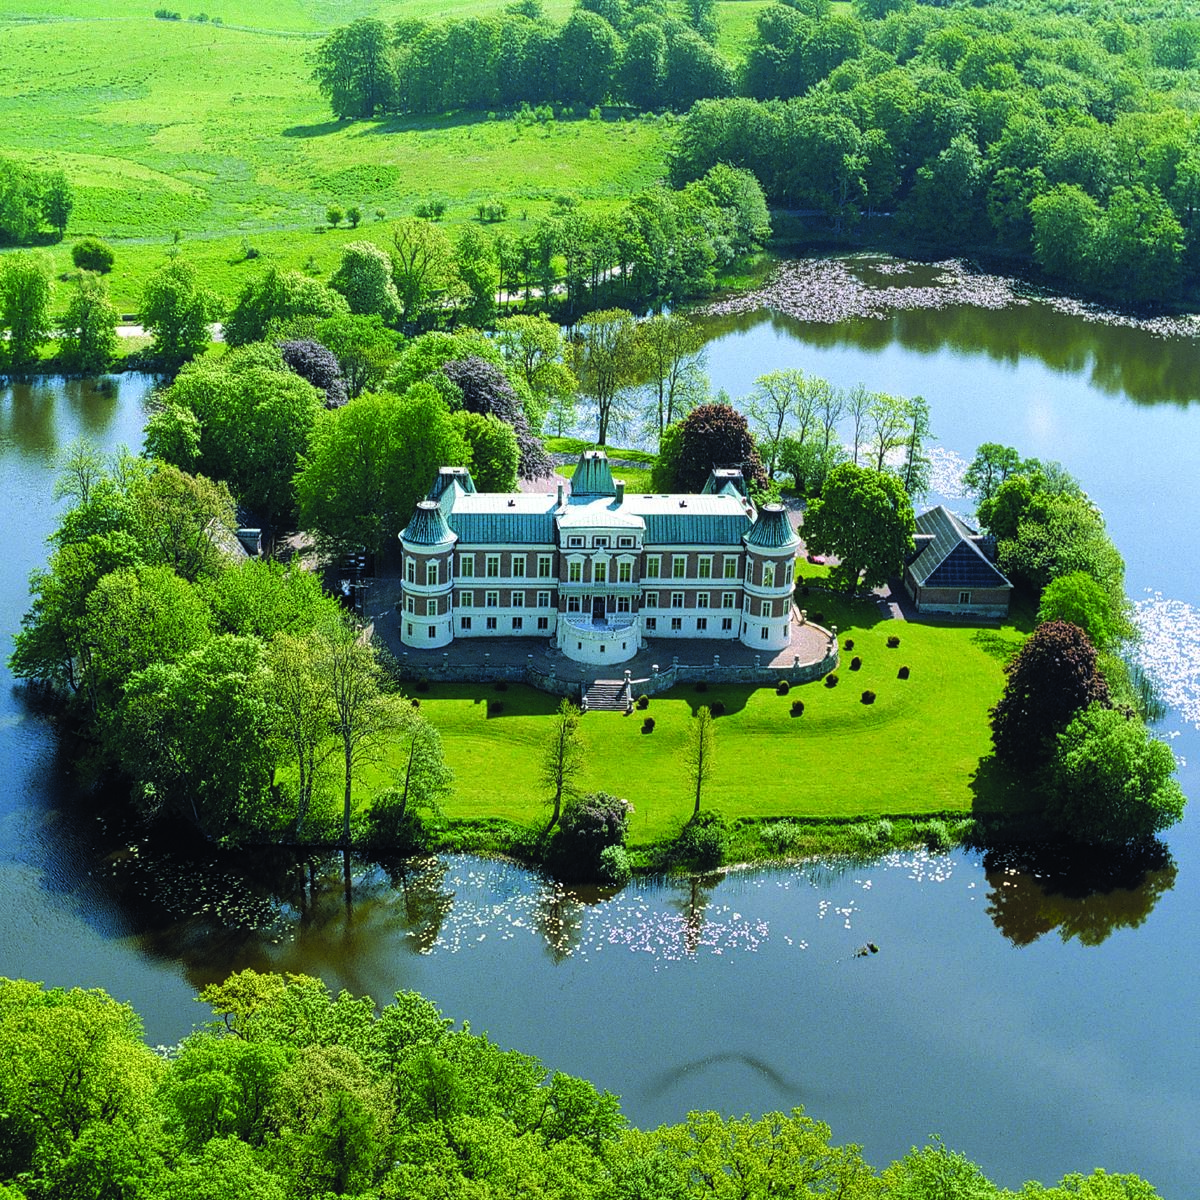 Häckeberga Castle